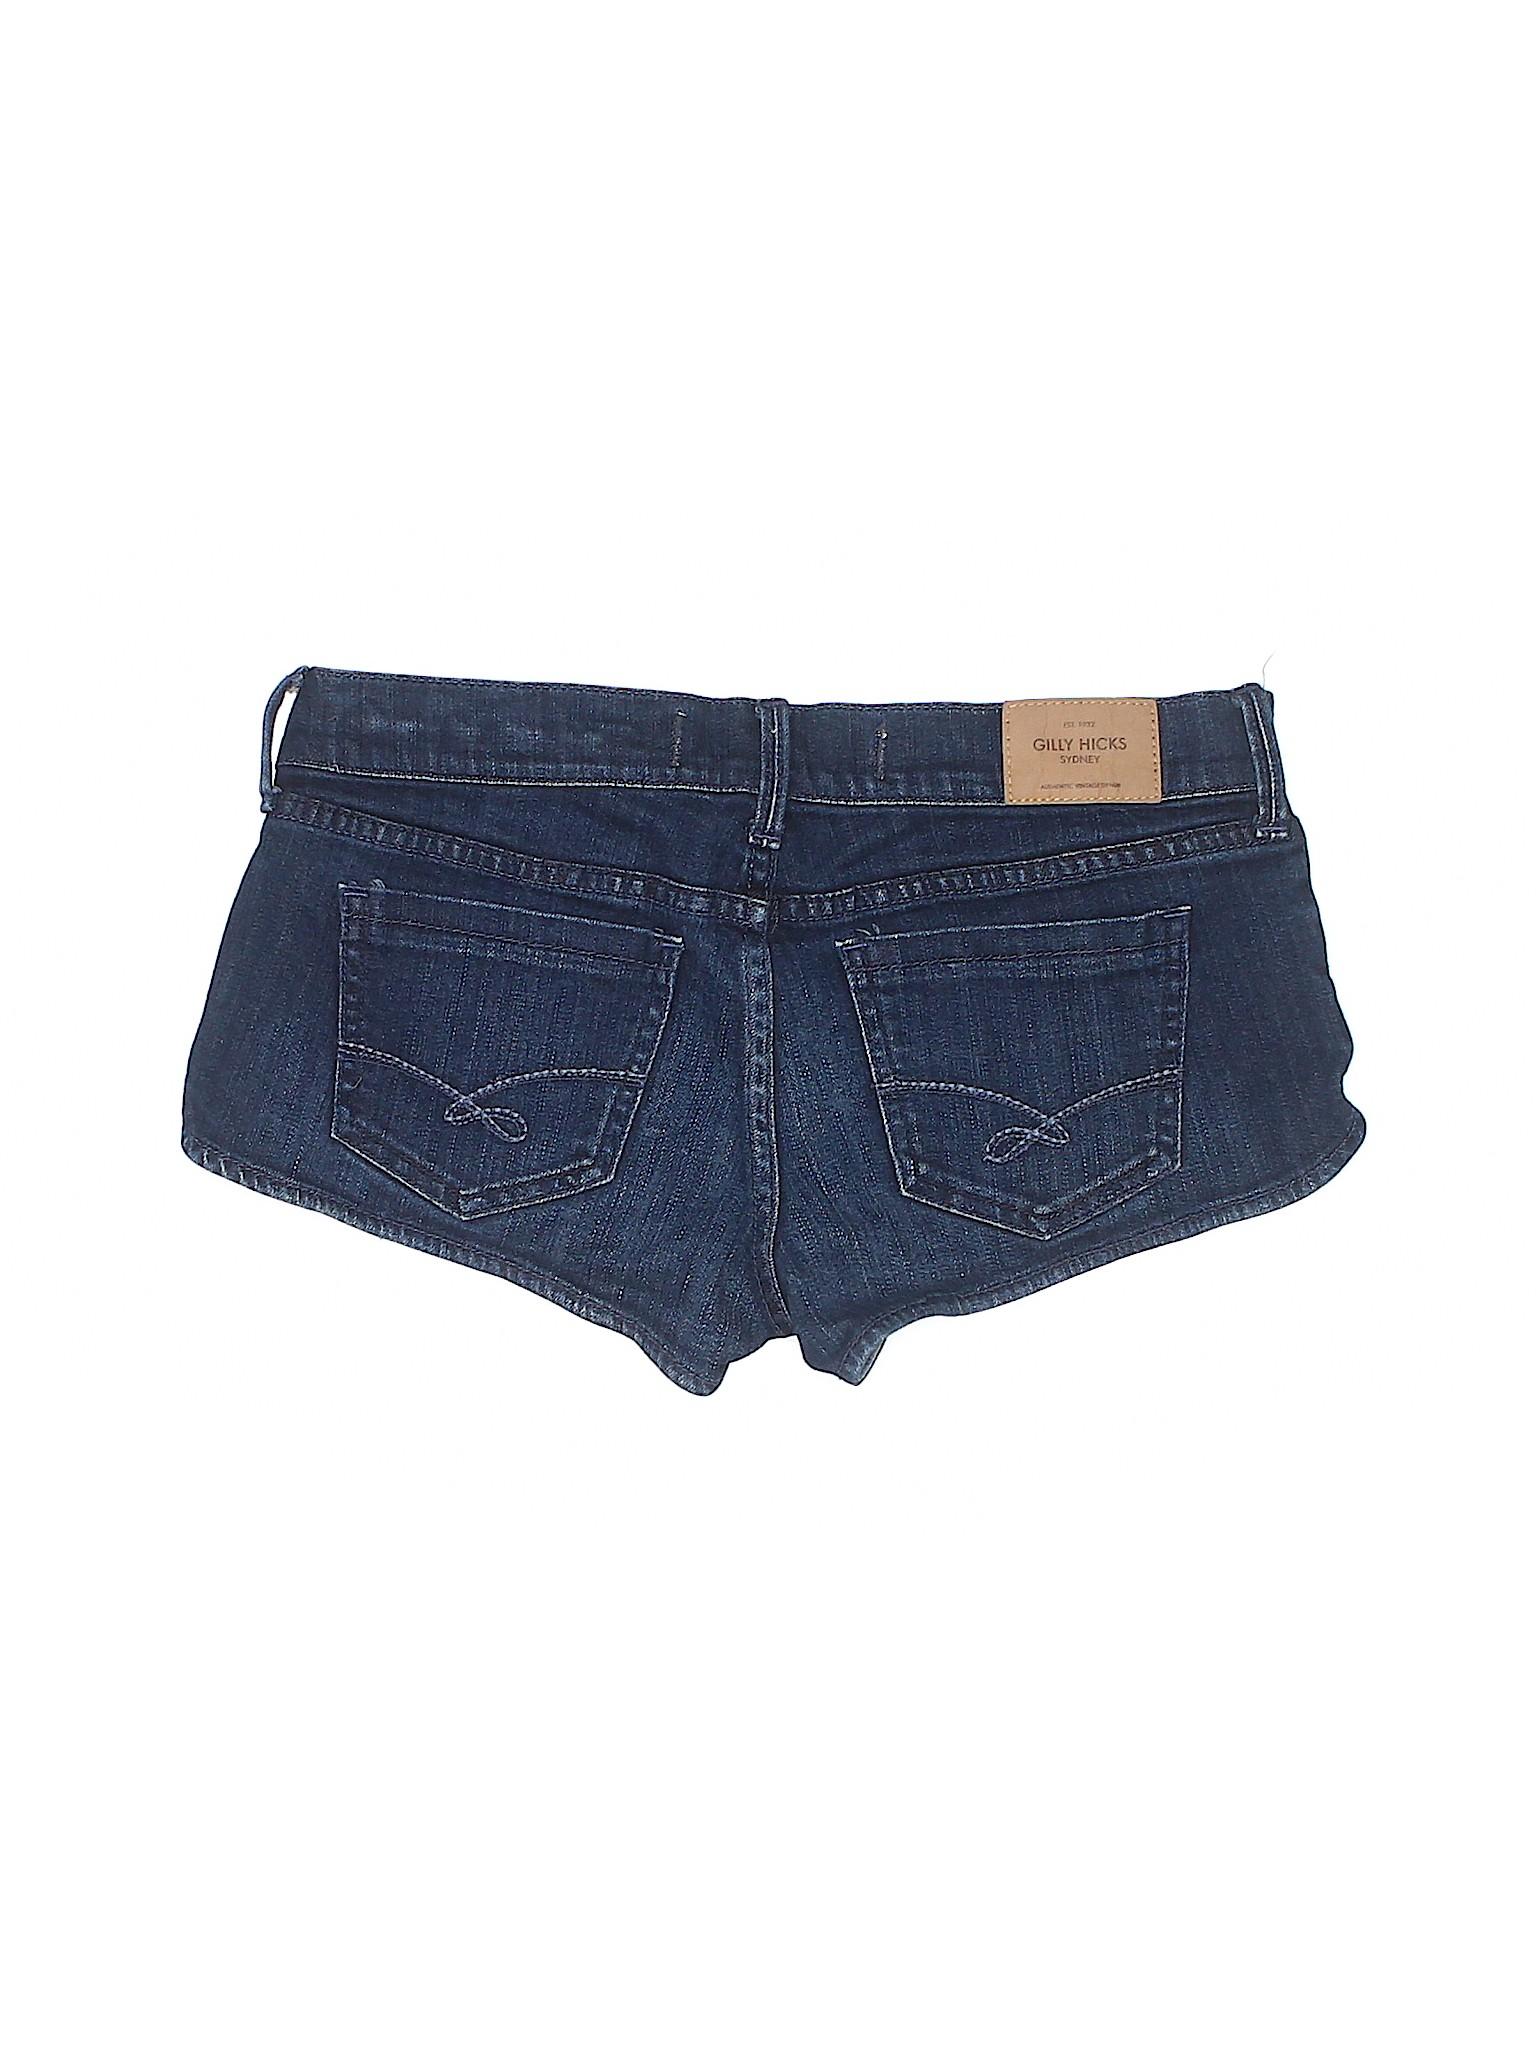 leisure Gilly Shorts Boutique Denim Hicks vdUqBgWw